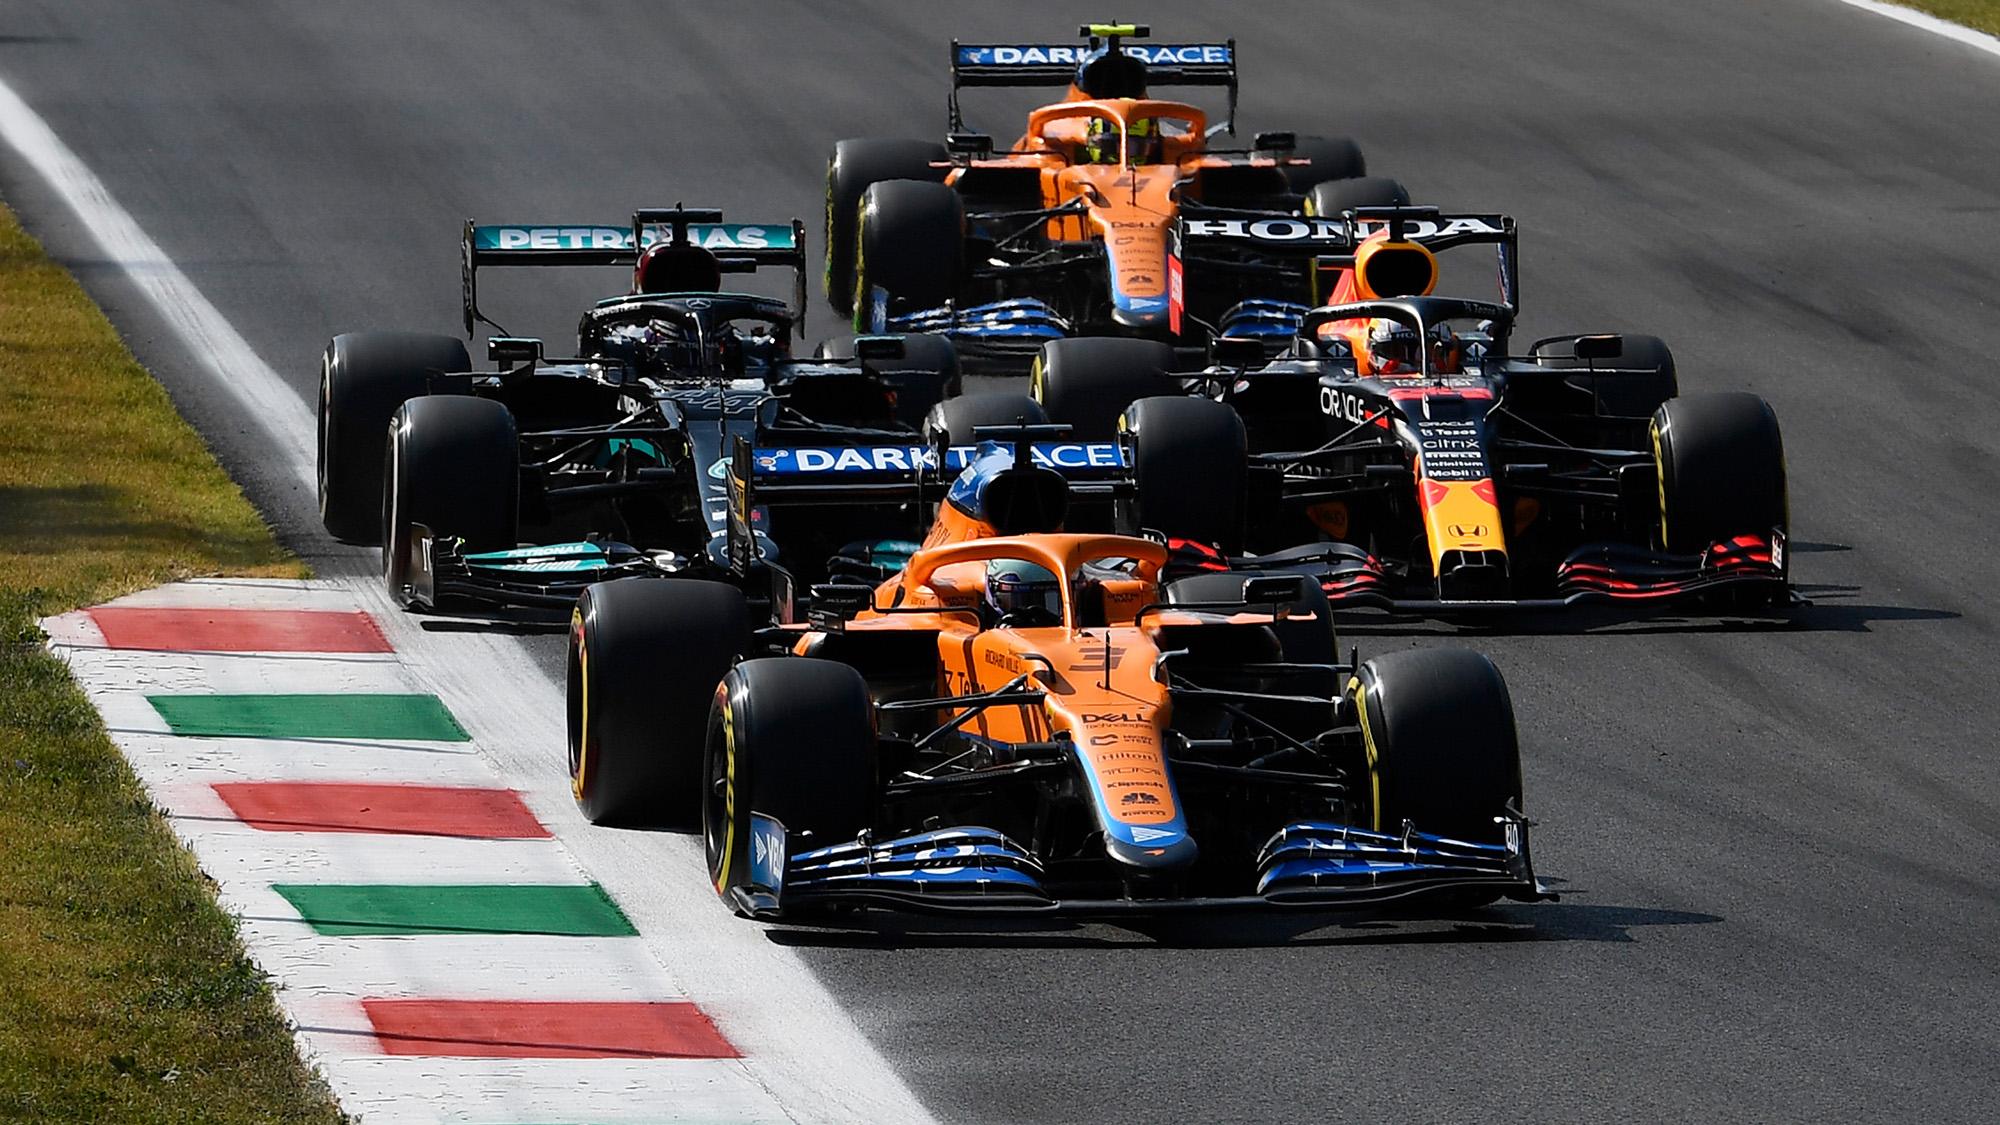 Ricciardo Hamilton Verstappen and Norris at the start of the 2021 Italian Grand Prix